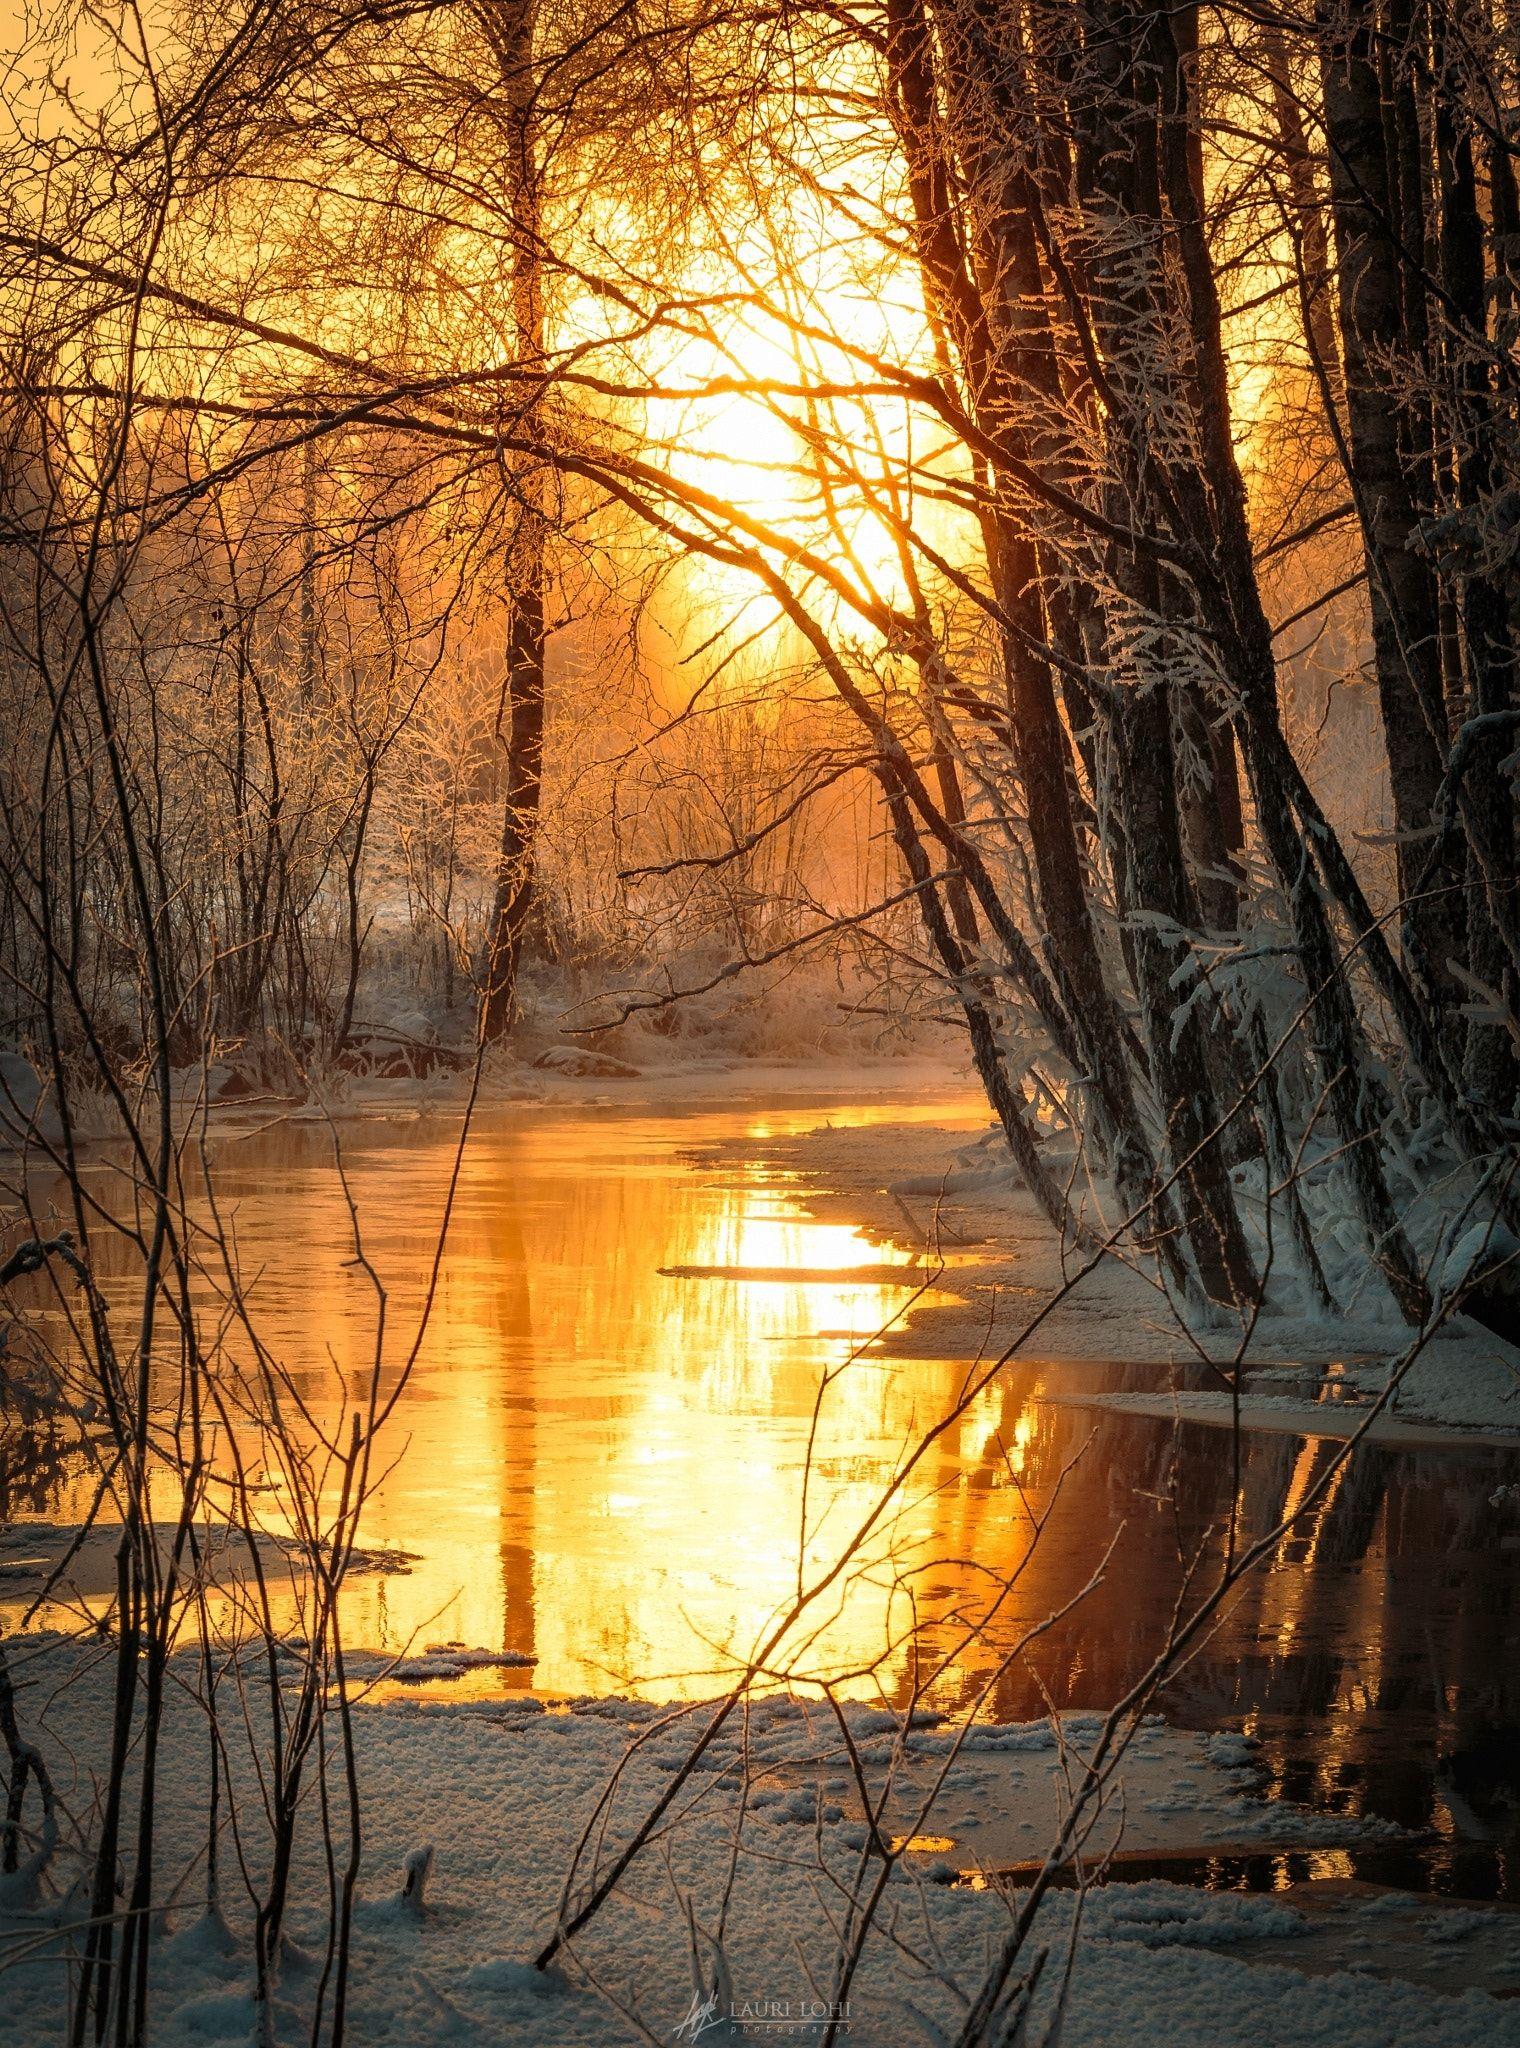 Wallpaper Fall River Ma Forest Creek Beautiful Winter Morning Light Reflecting